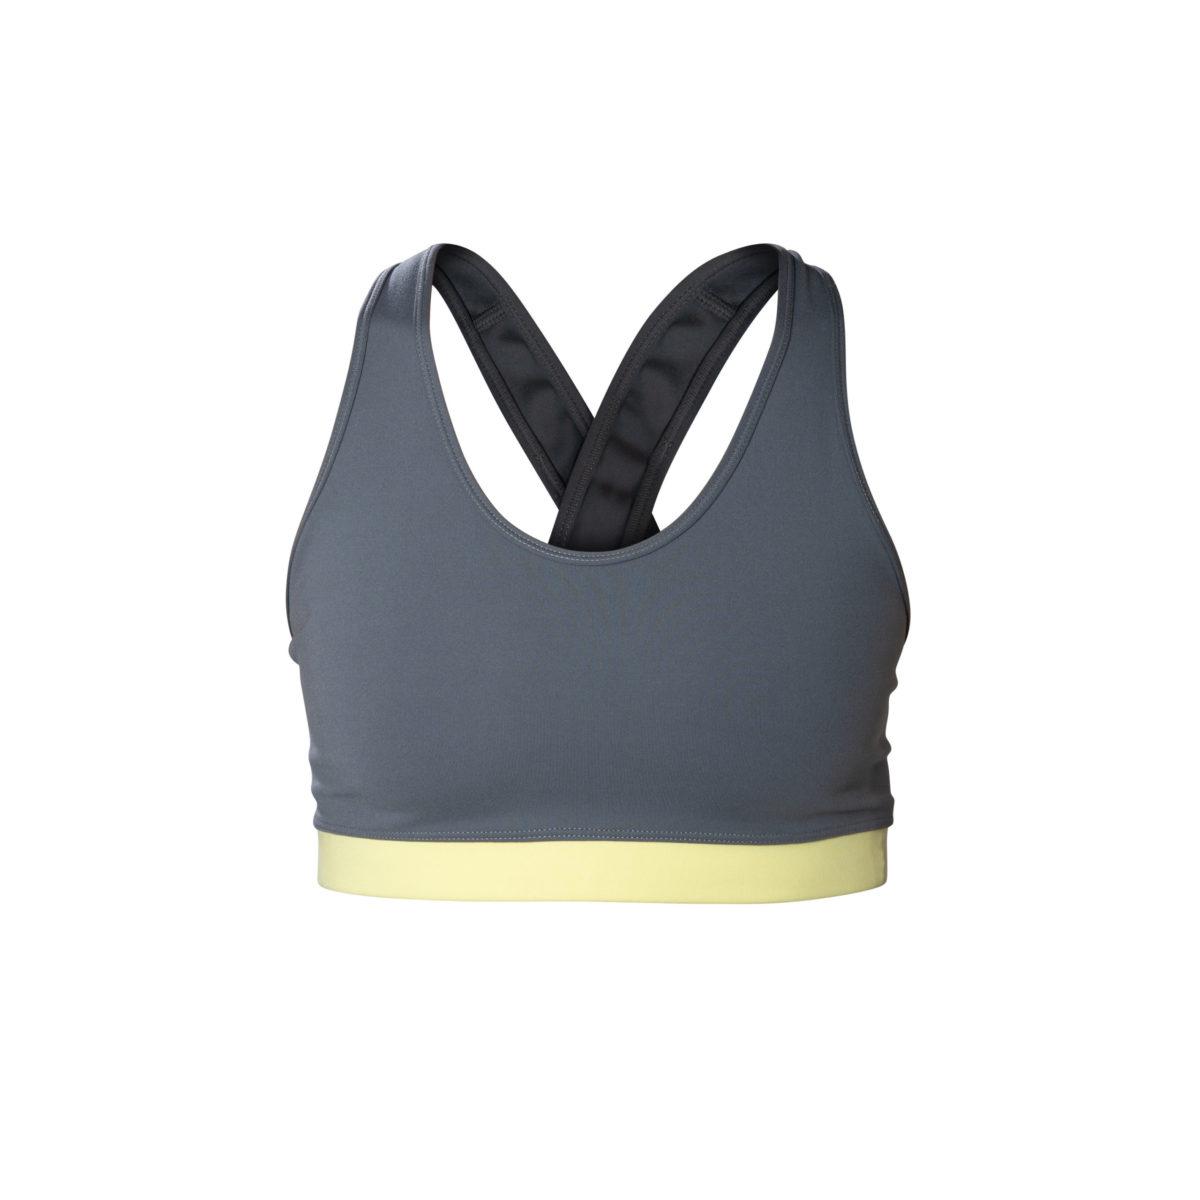 grey crossed bra front view